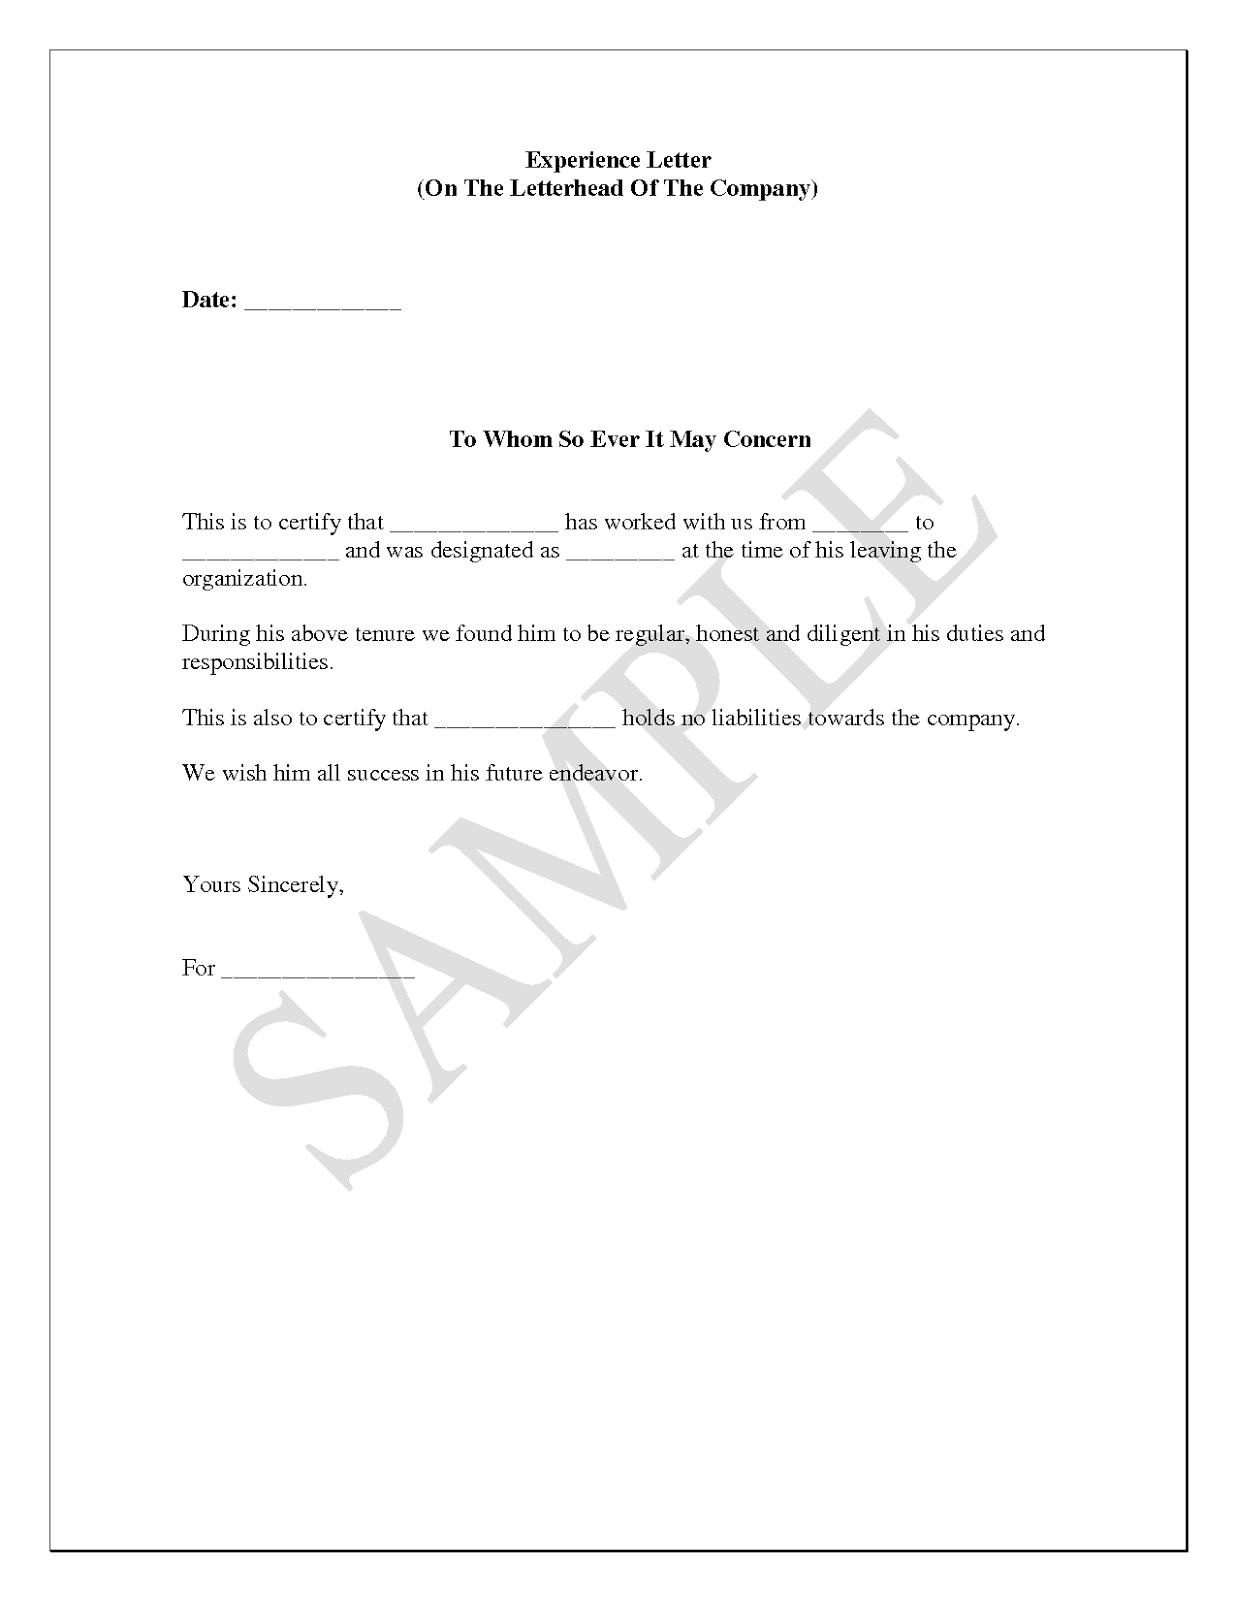 Srikala novels pdf free download